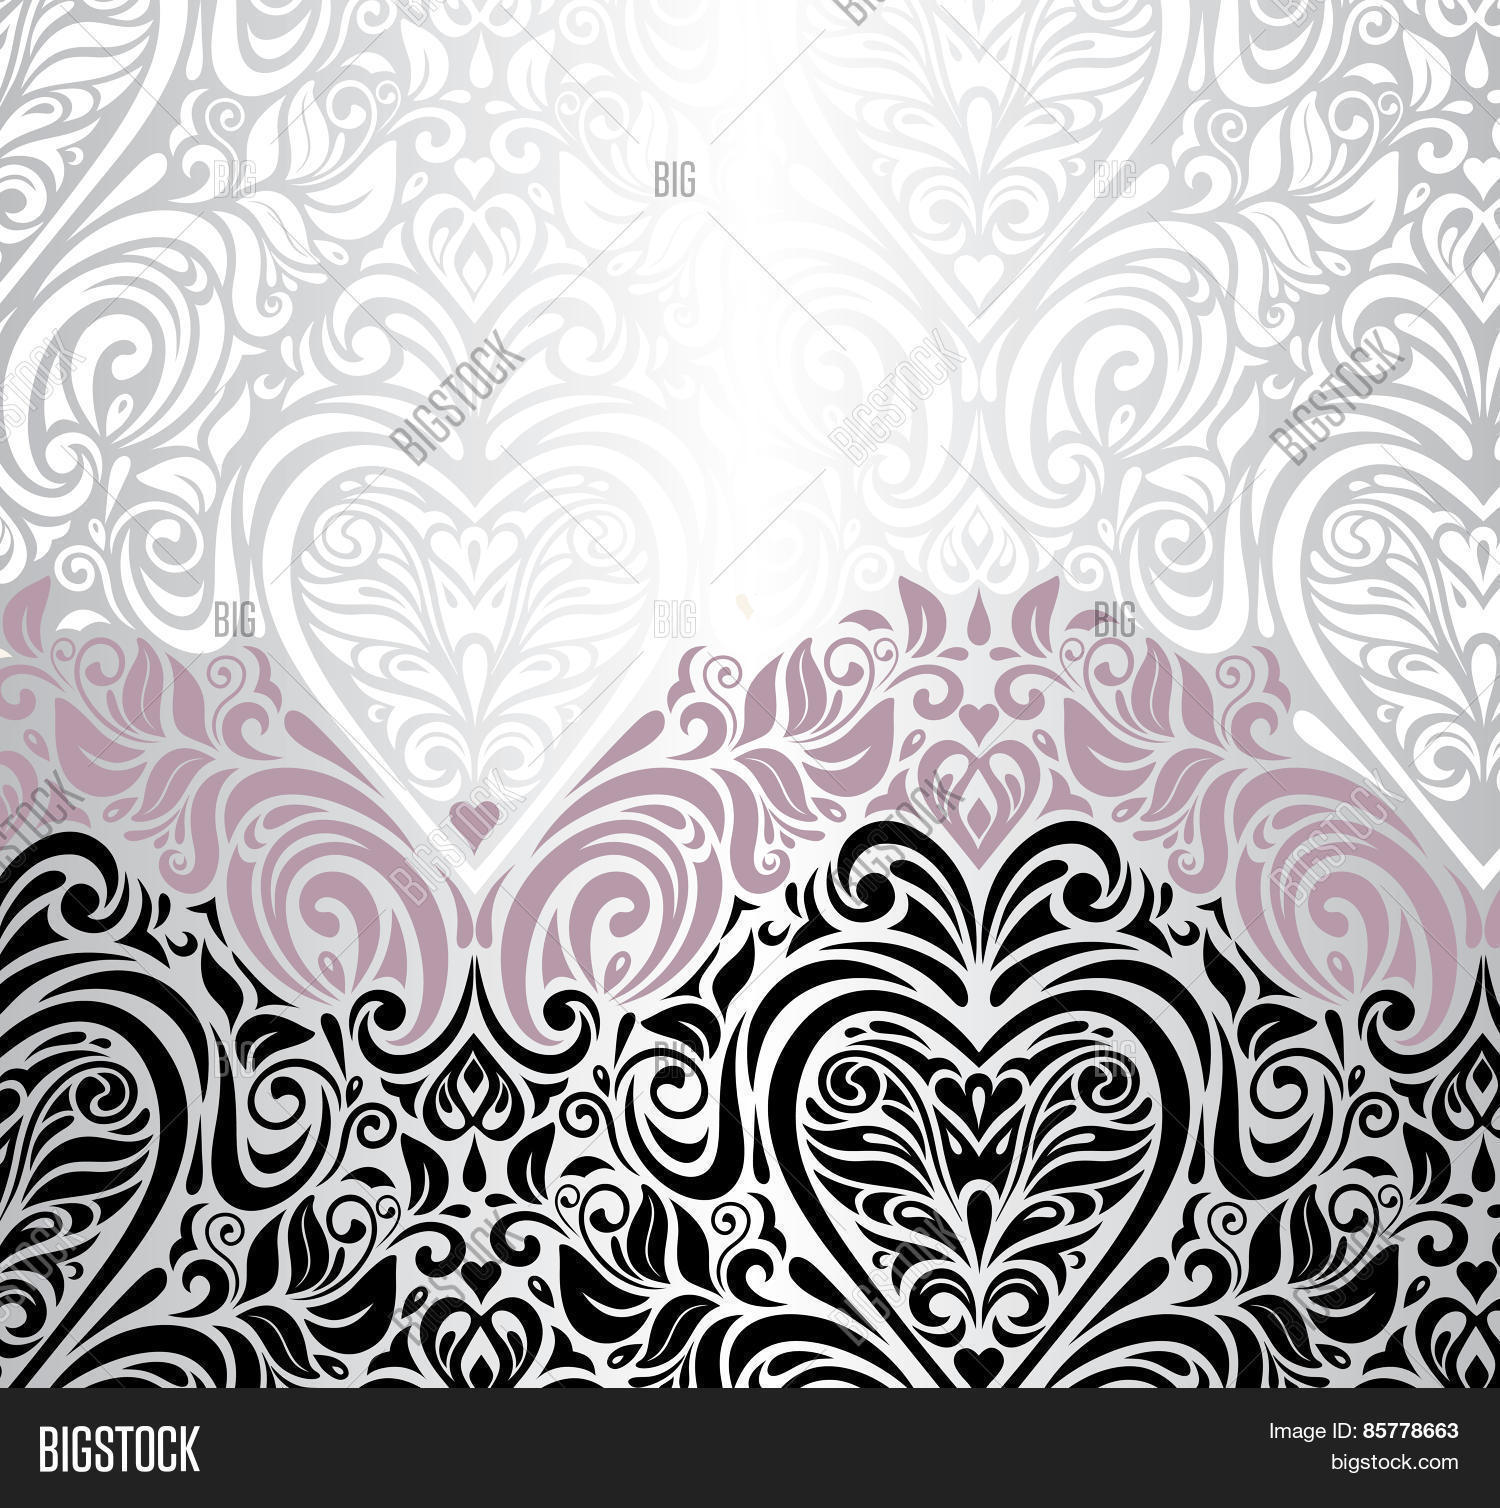 Pink Silver Black Vector & Photo (Free Trial) | Bigstock